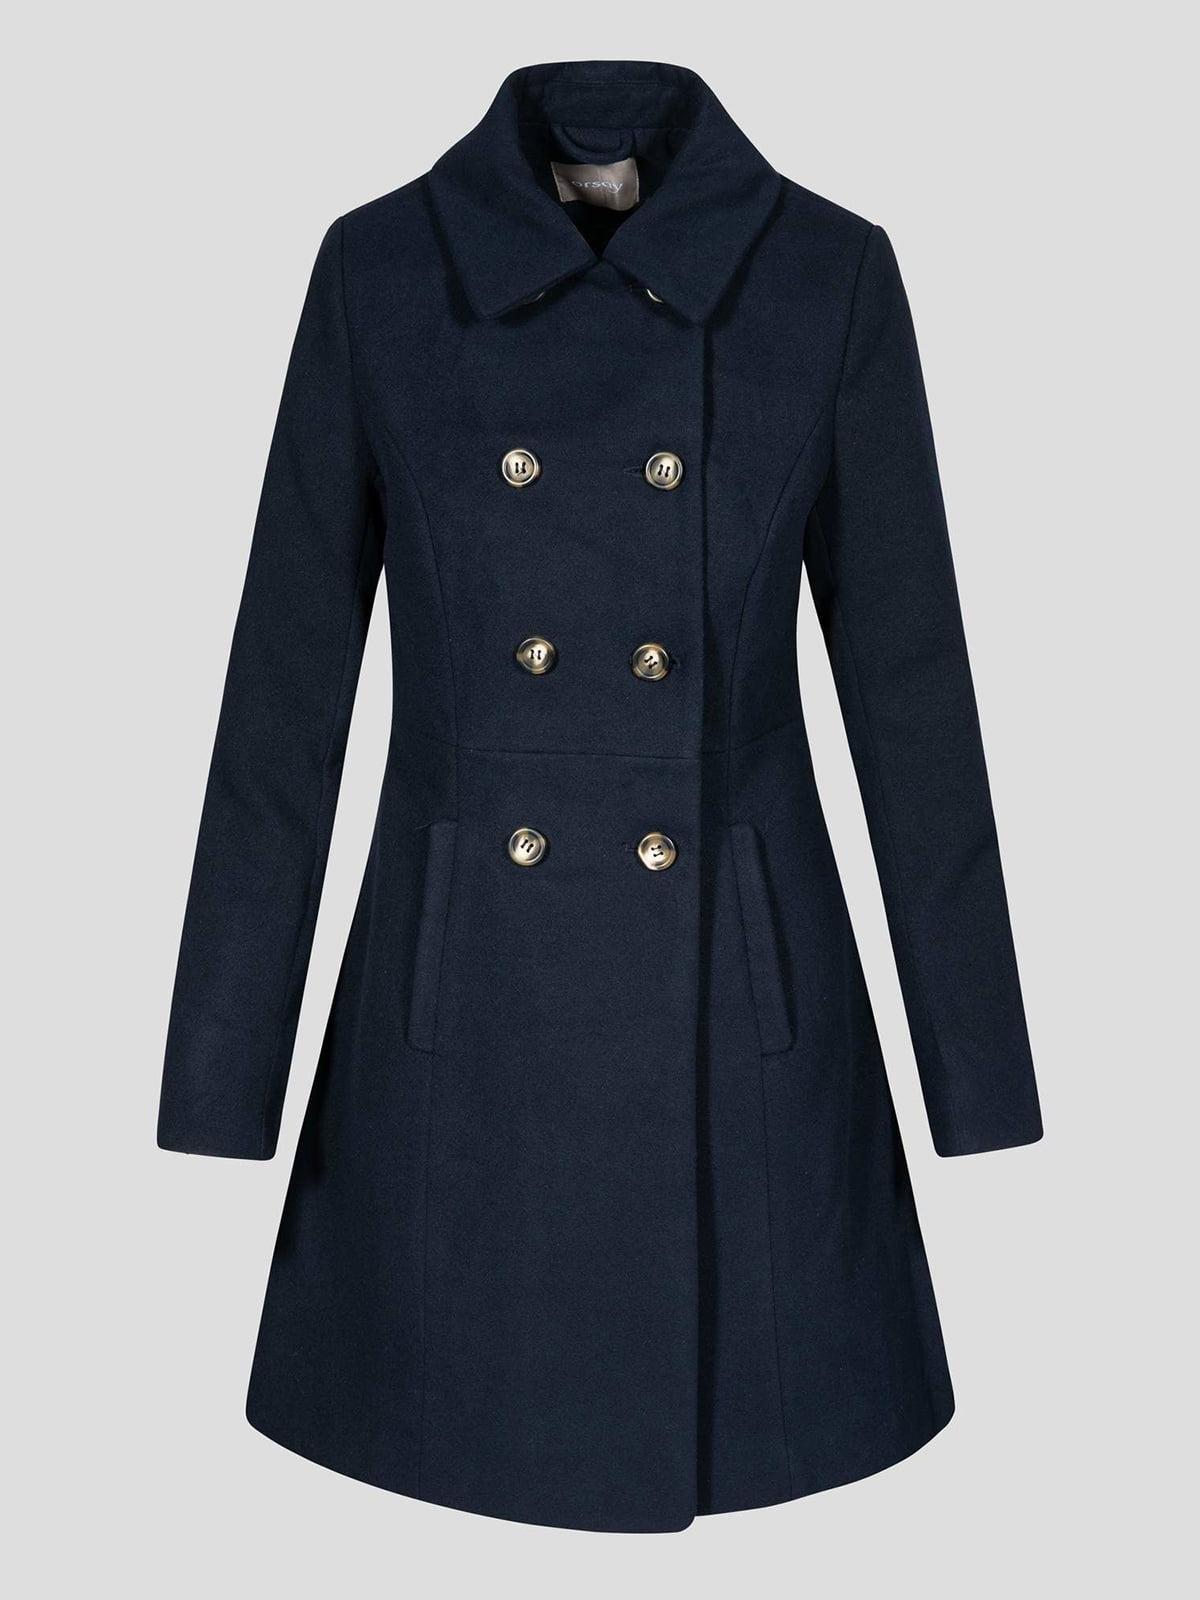 Пальто синє | 4677712 | фото 13